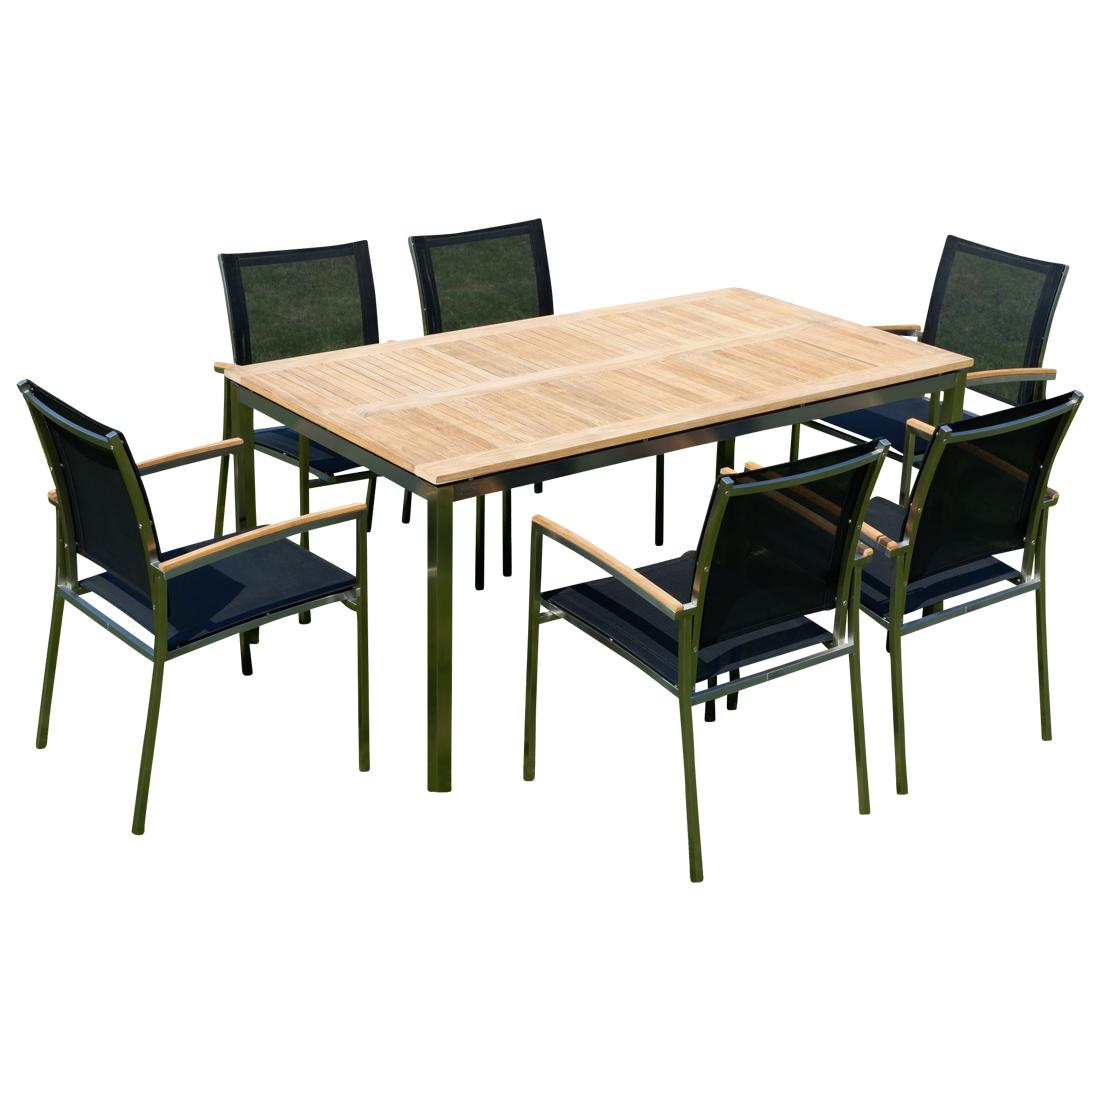 Gartengarnitur Edelstahl Teak Set: Tisch 160x90 cm + 6 Sessel Serie ...